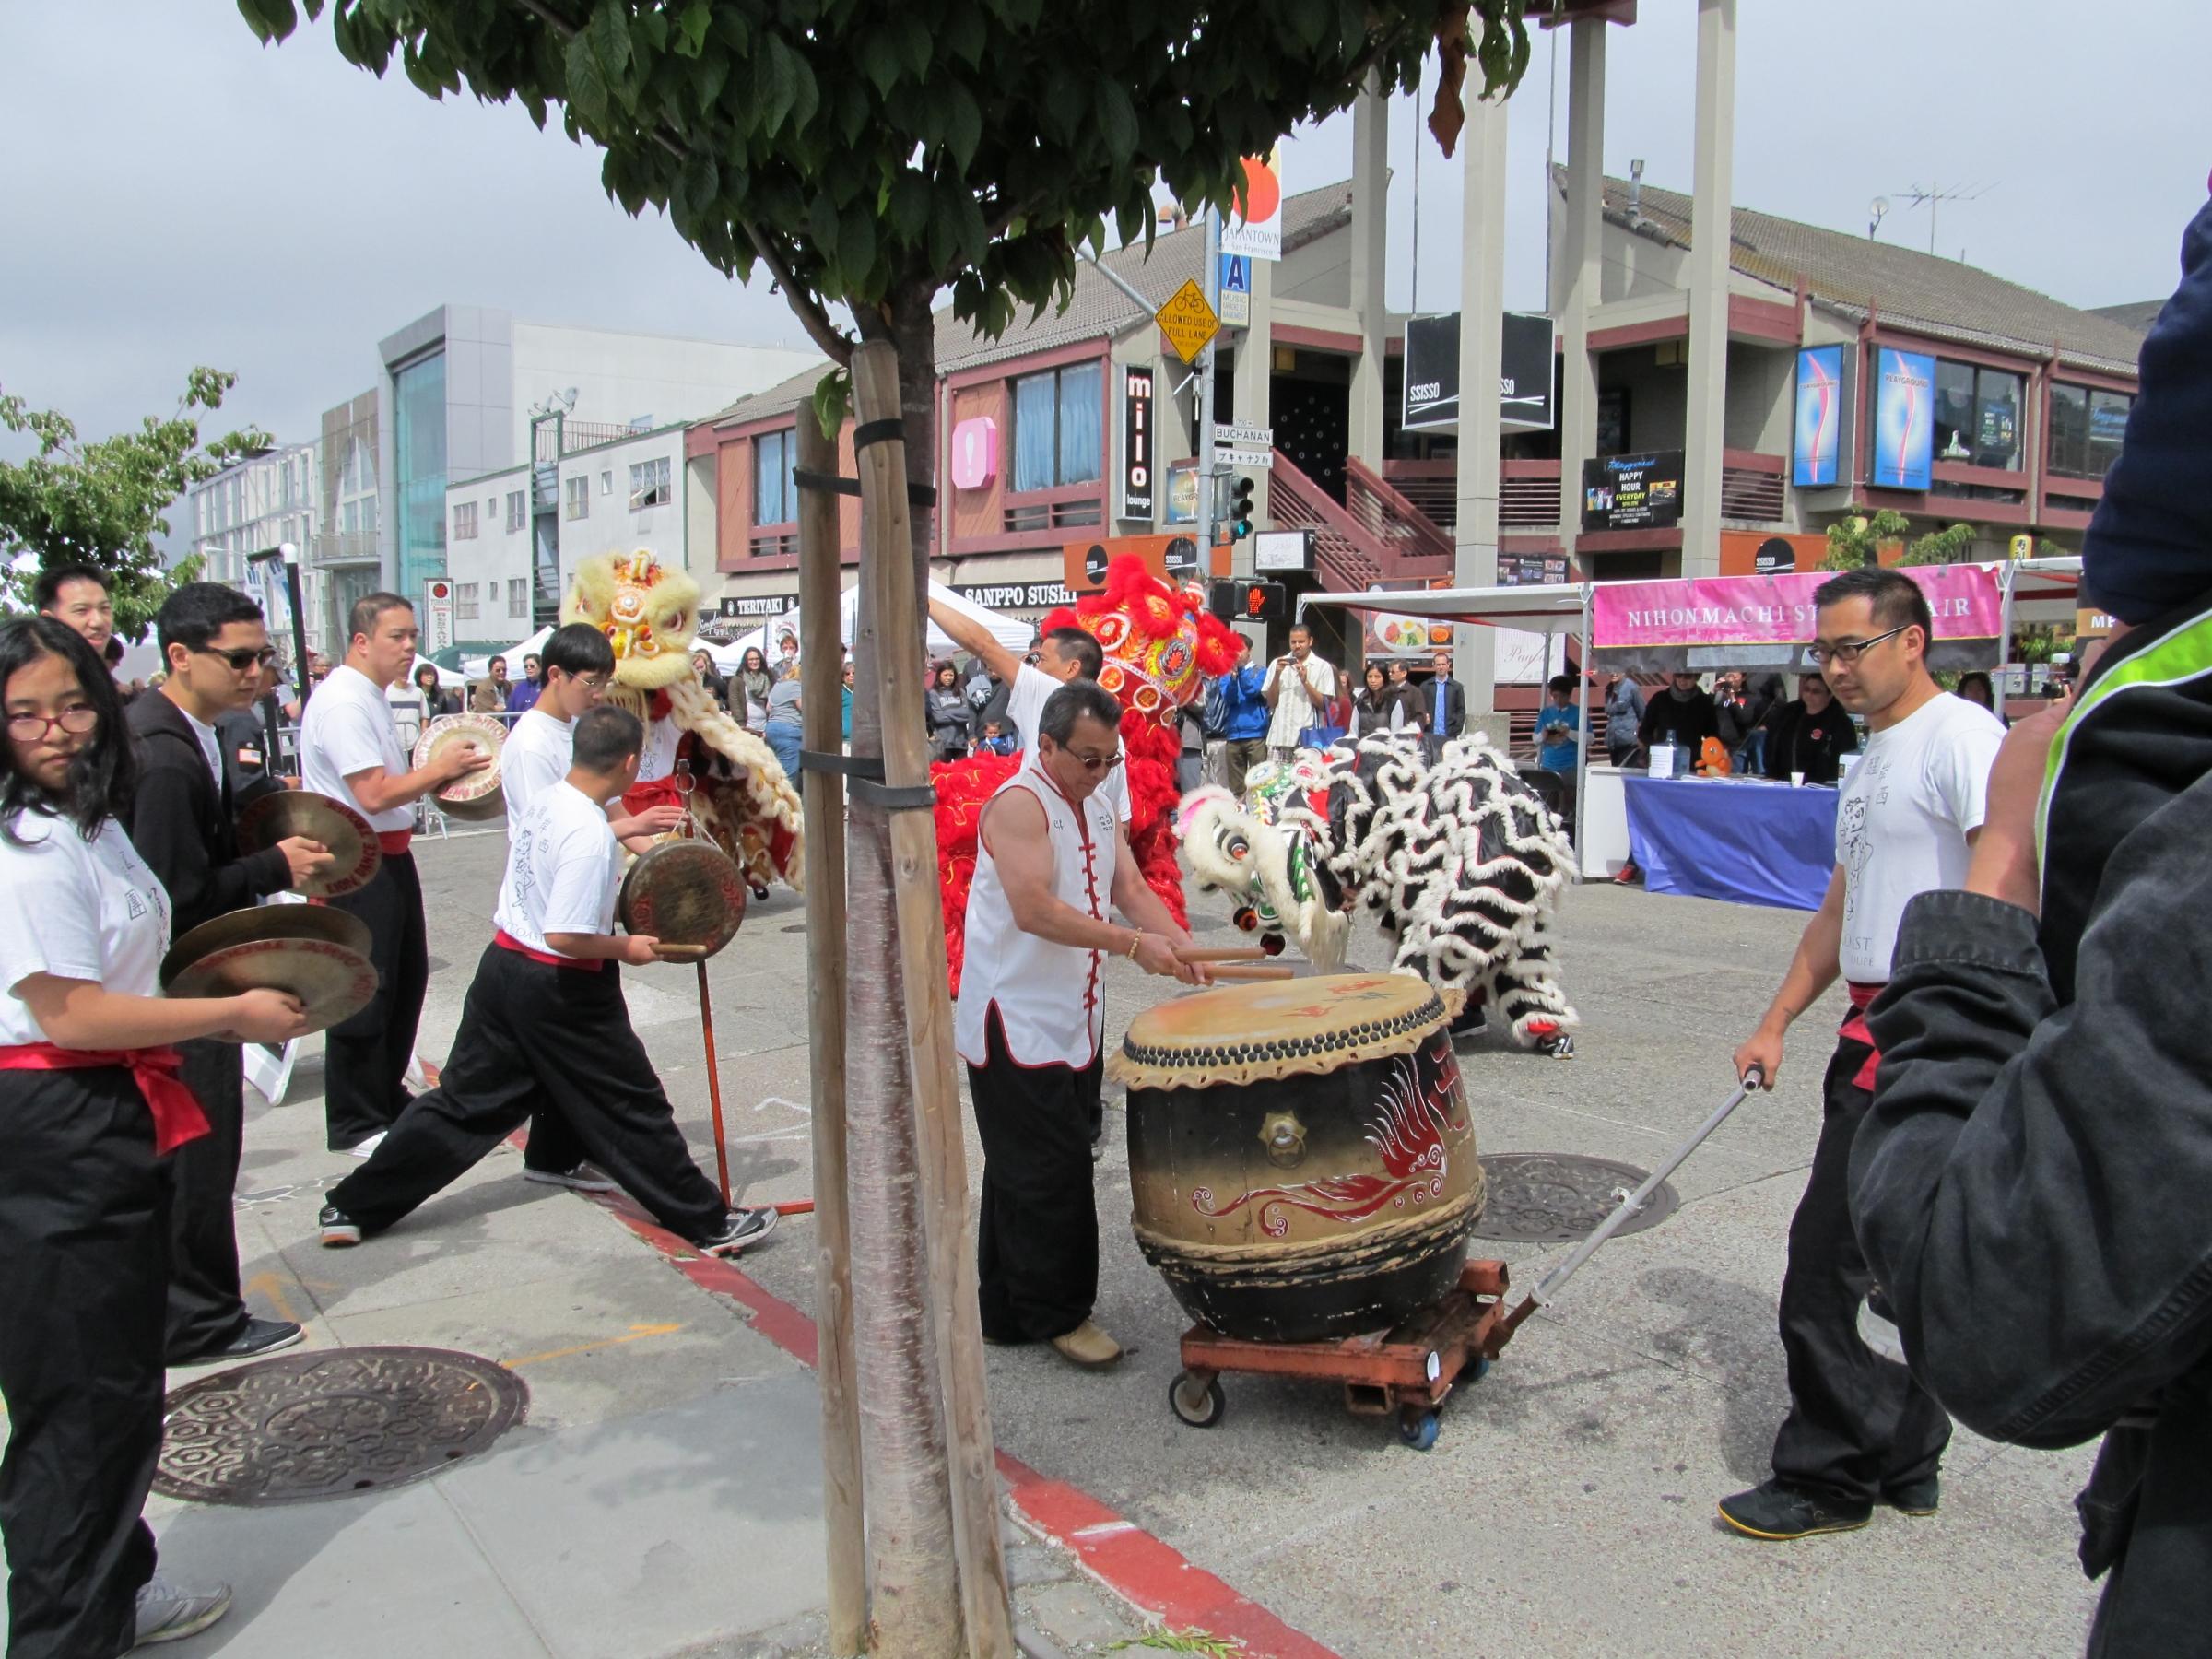 Asian street fair